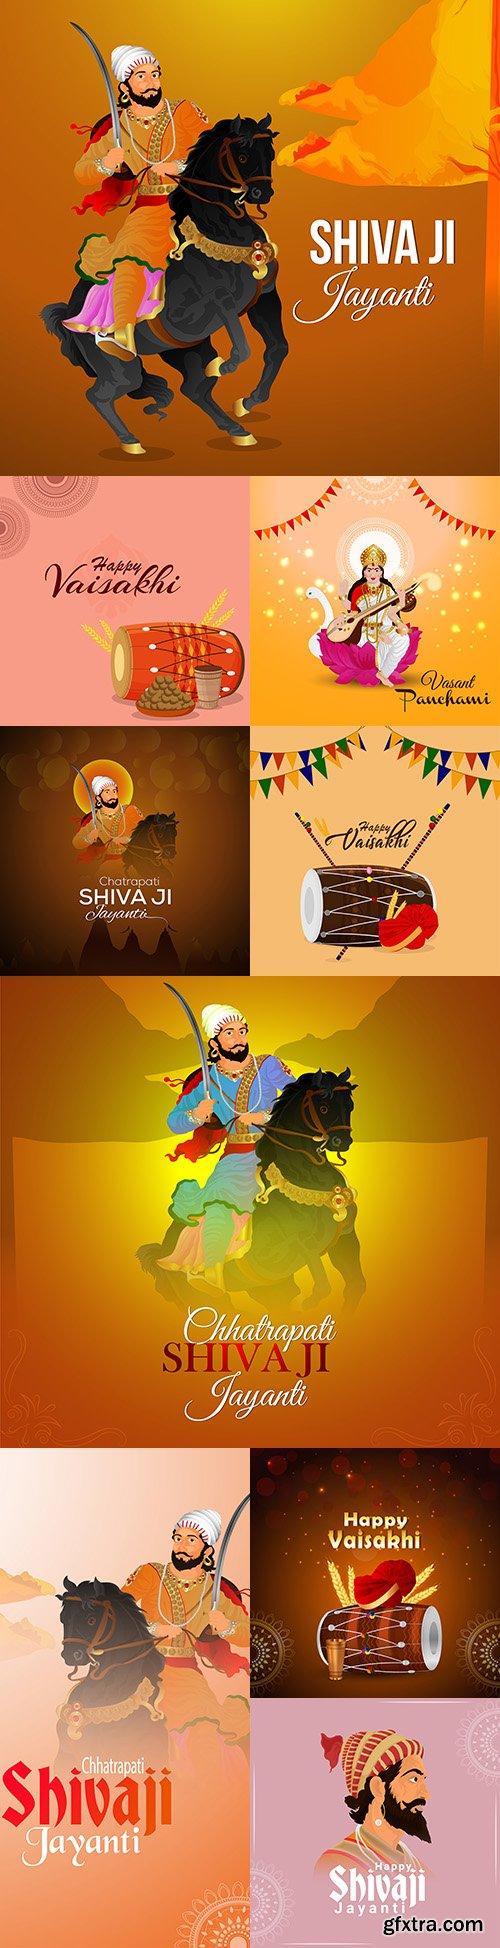 Shivaji Jayanti and Vasant Panchami illustration day celebration